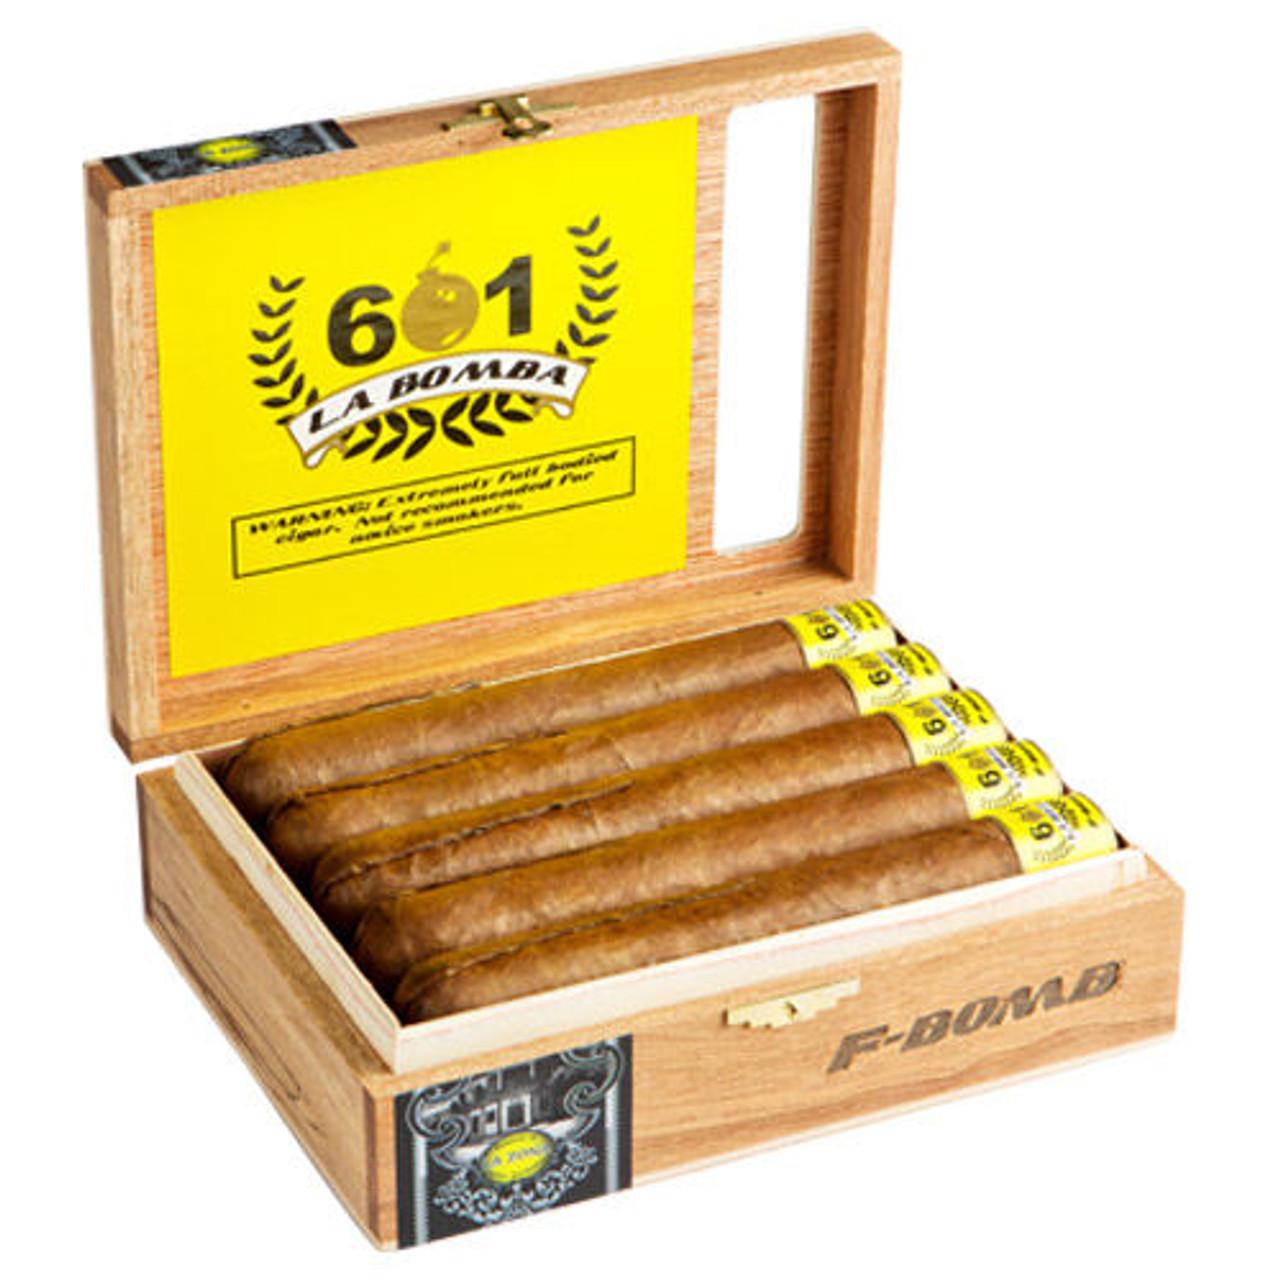 601 La Bomba F-Bomb - 7 x 70 Cigars (Box of 10)